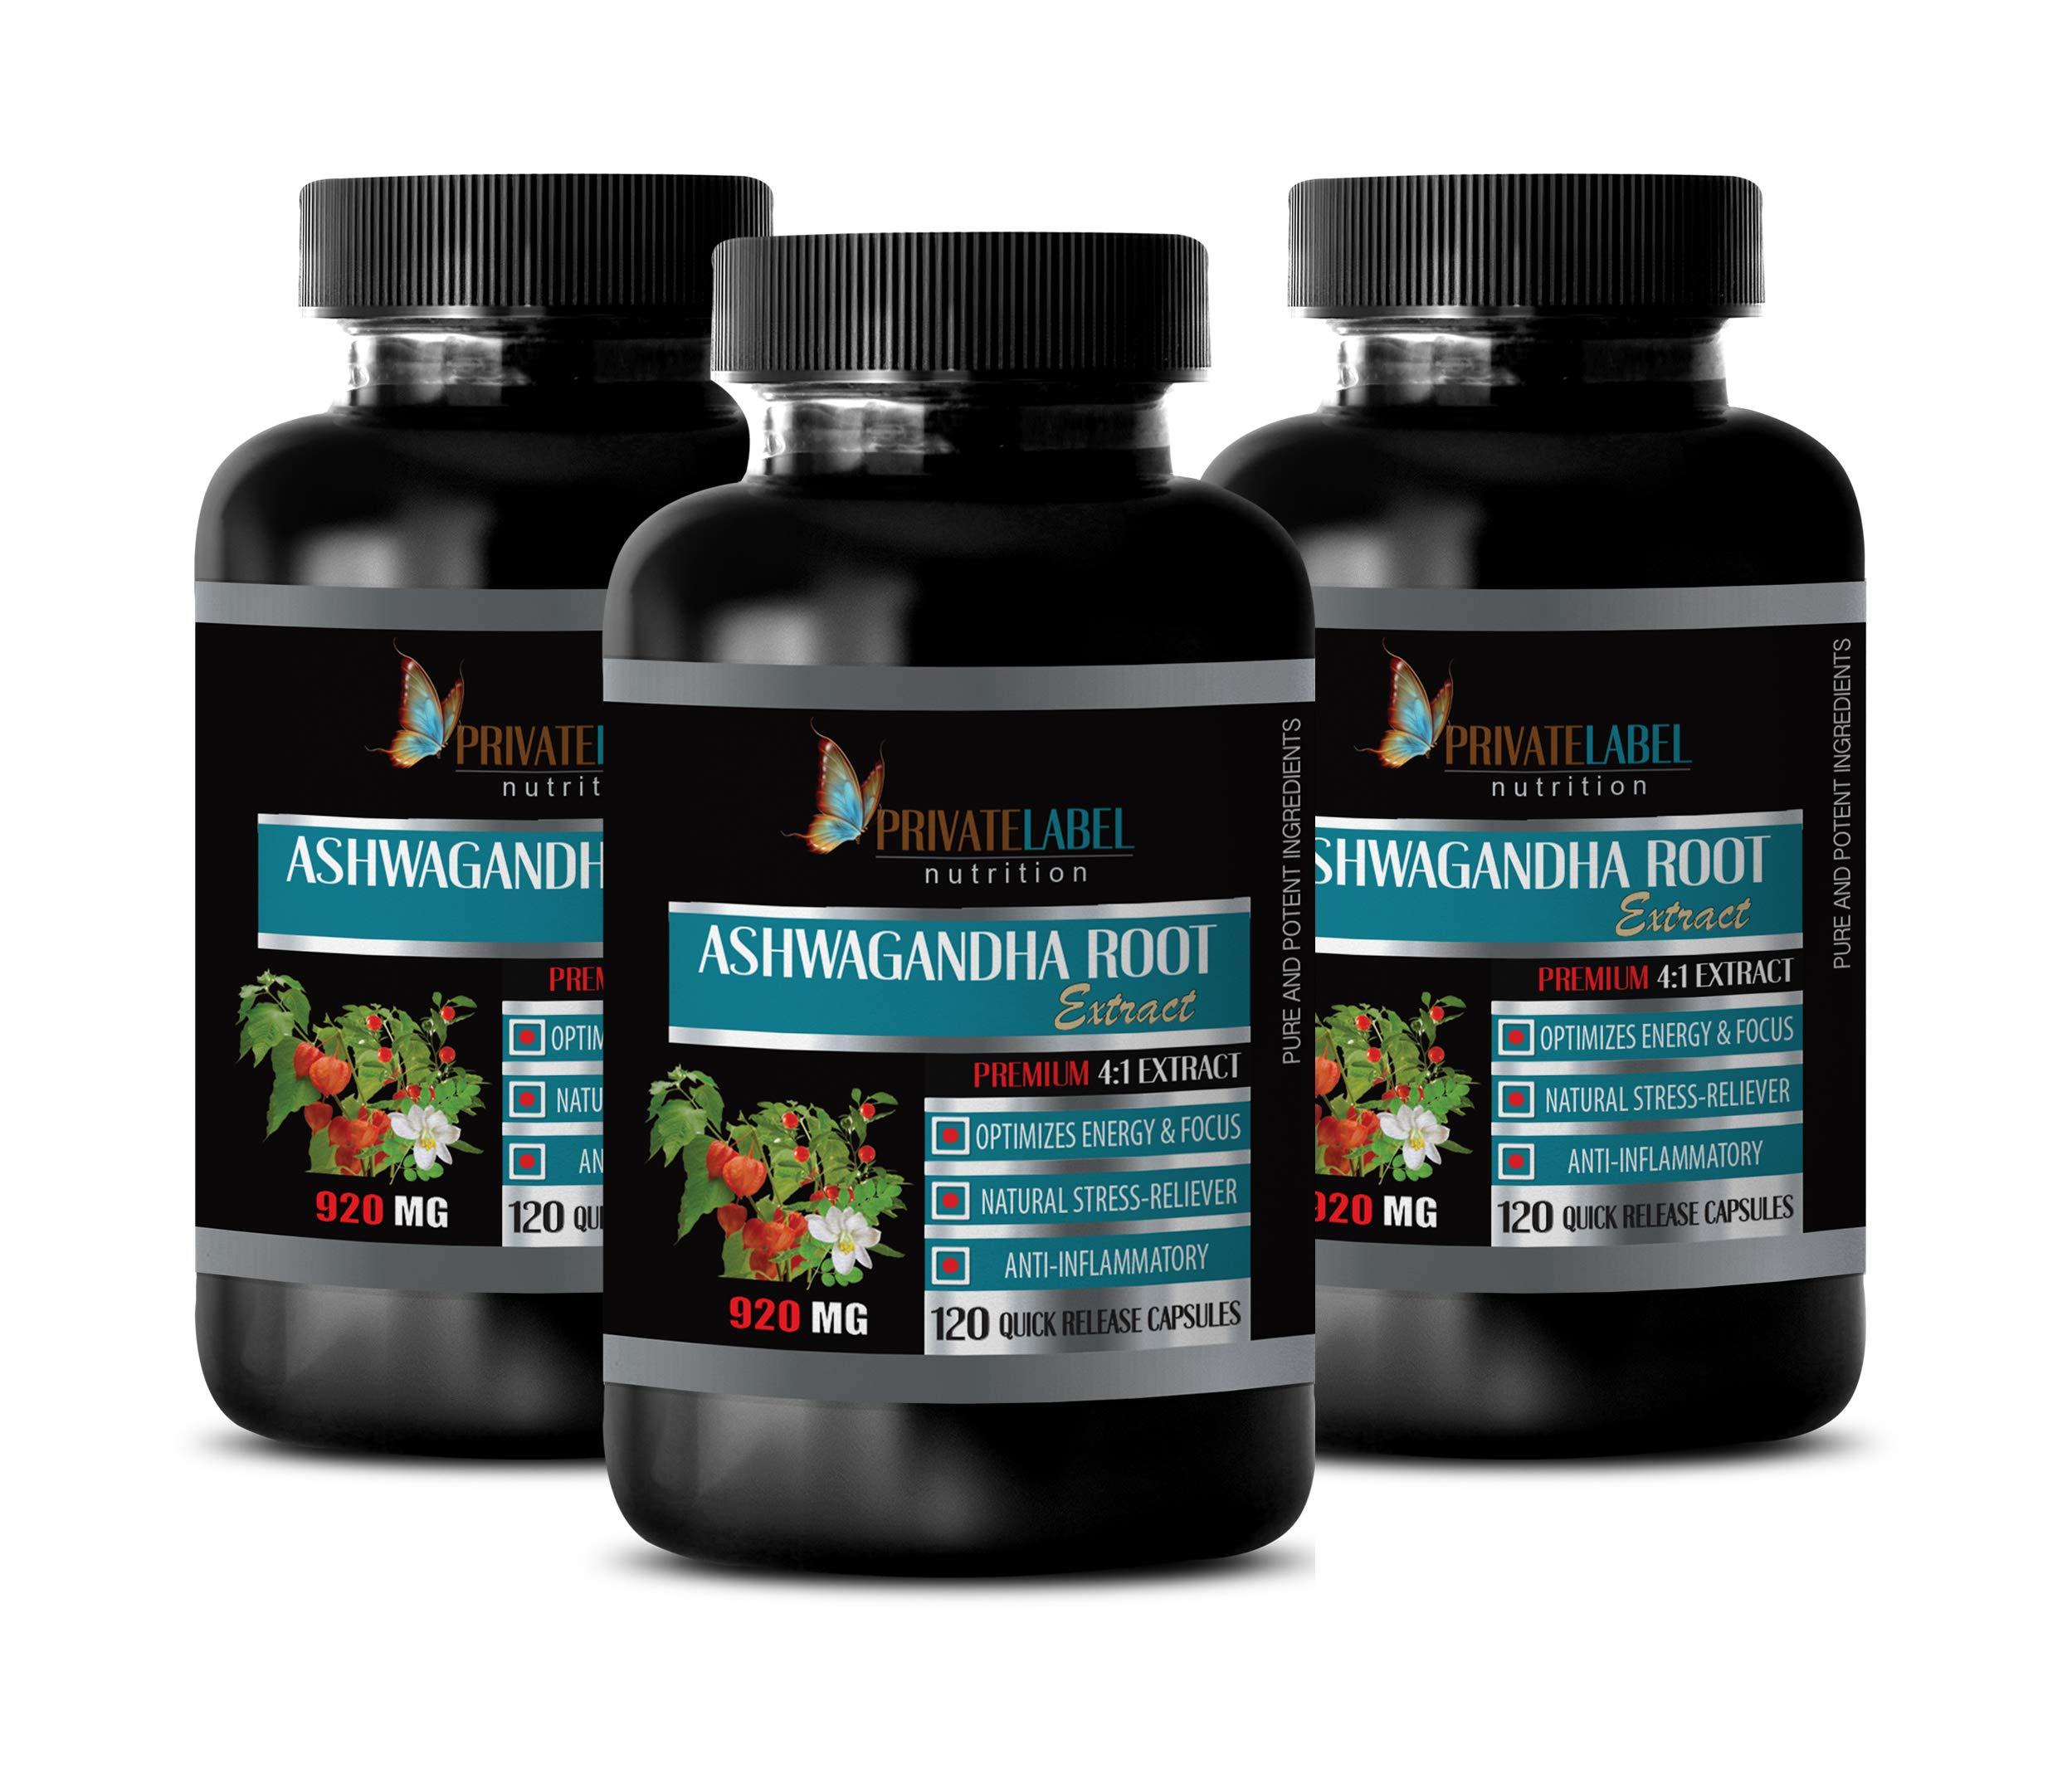 Brain Health Supplement - Memory Mind & Focus Enhancer - ASHWAGANDHA Root Premium 4:1 Extract - ashwagandha Capsules for Fertility - 3 Bottles 360 Capsules